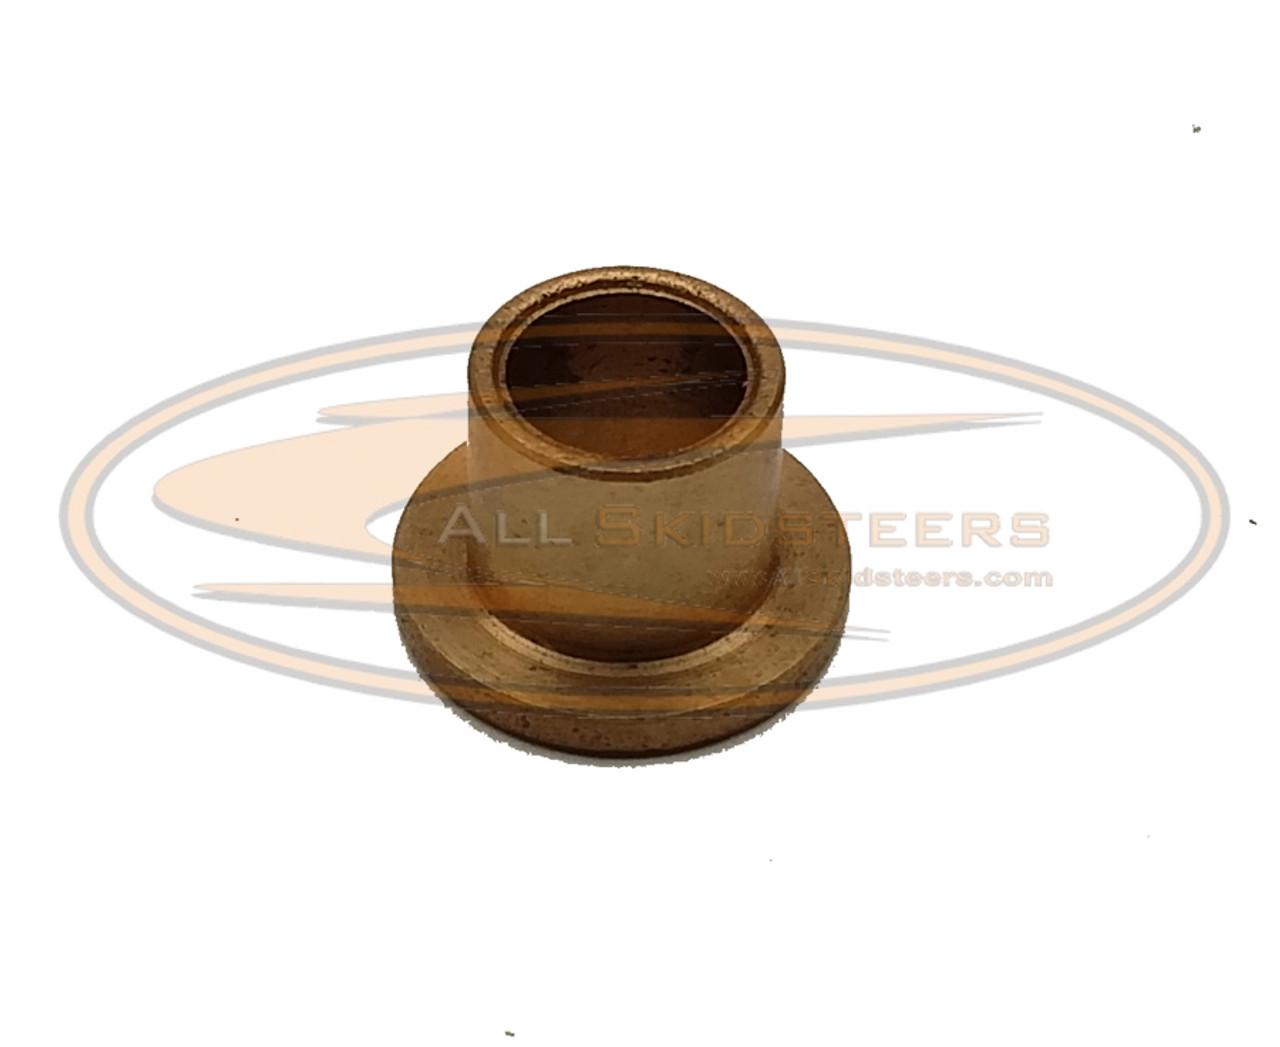 Steering Lever Bushing for Bobcat® Skid Steer | Replaces OEM # 6579990